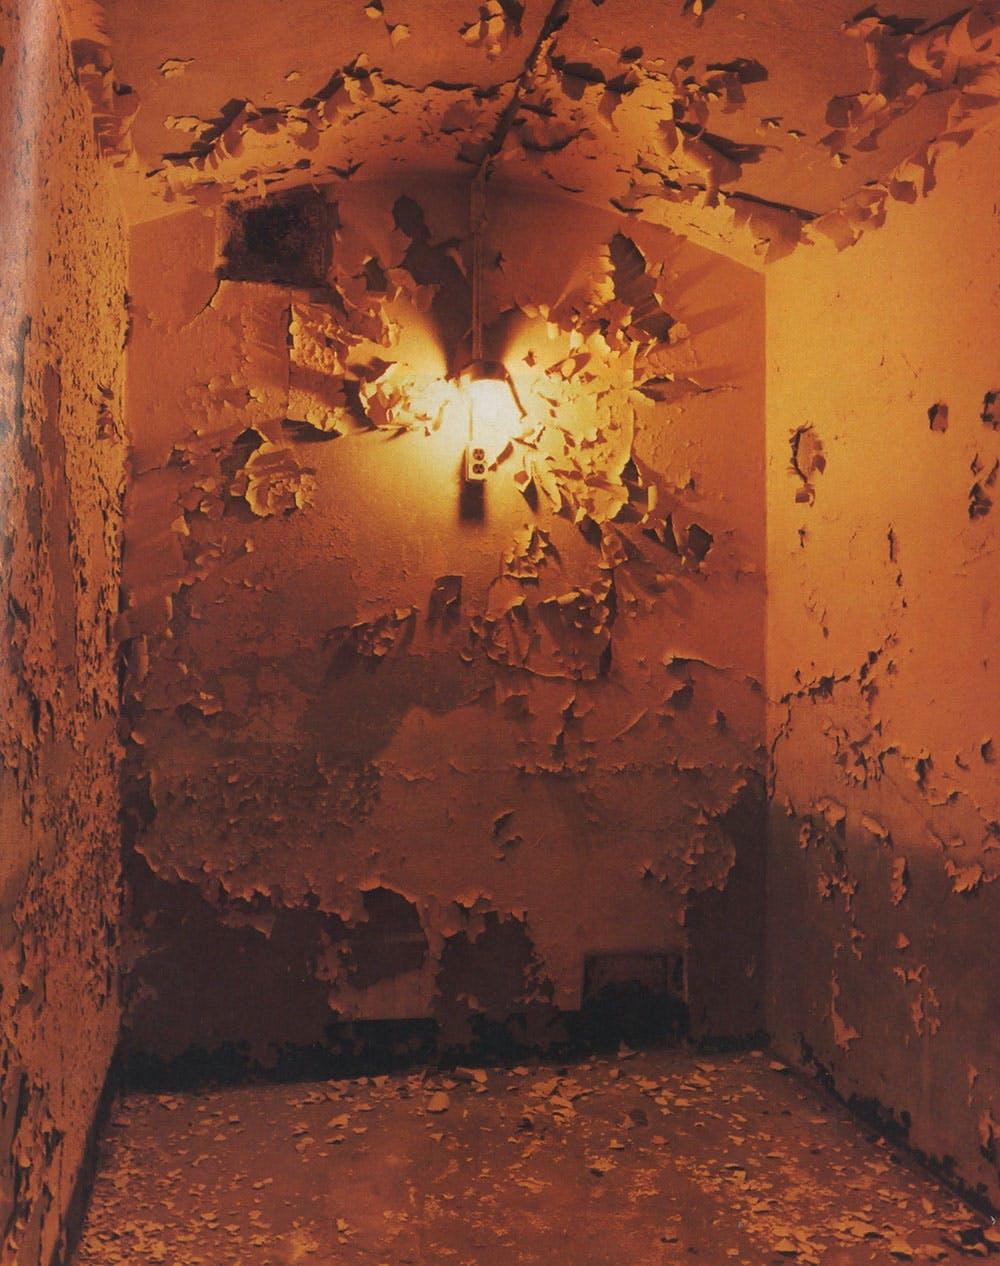 Texas State Penitentiary, Huntsville Unit, Huntsville